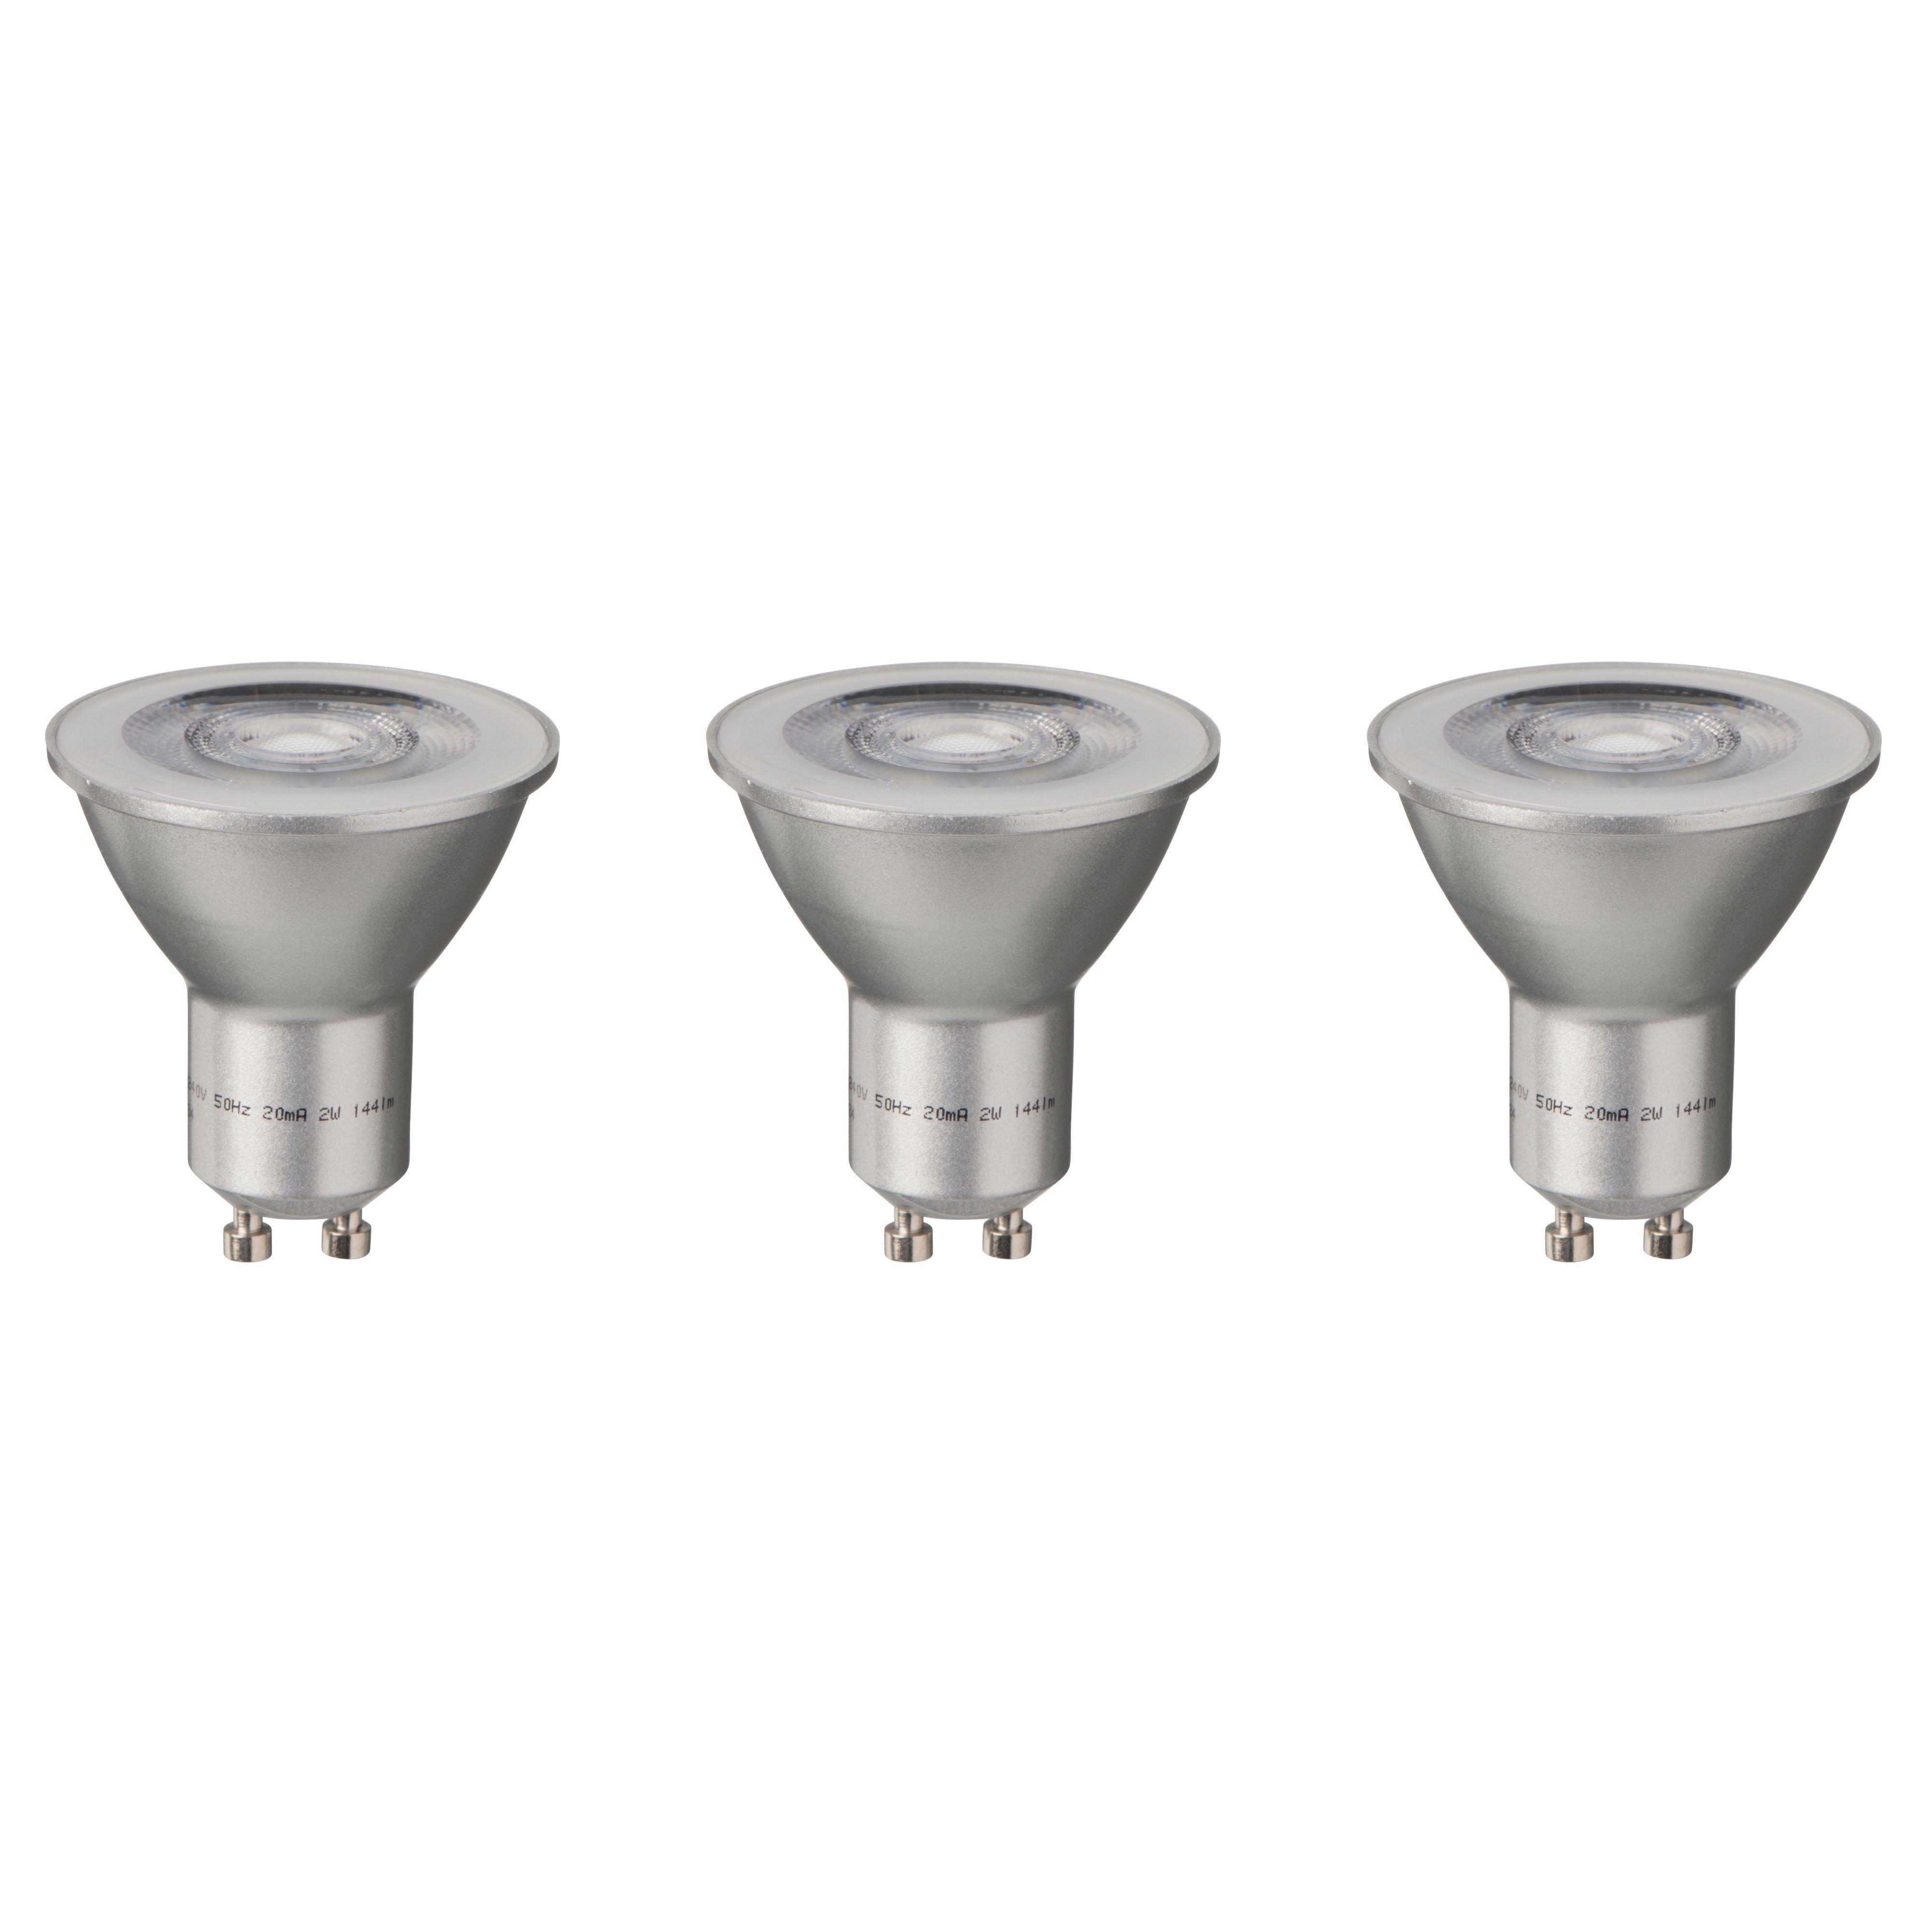 Diall Gu10 144lm Led Reflector Light Bulb, Pack Of 3